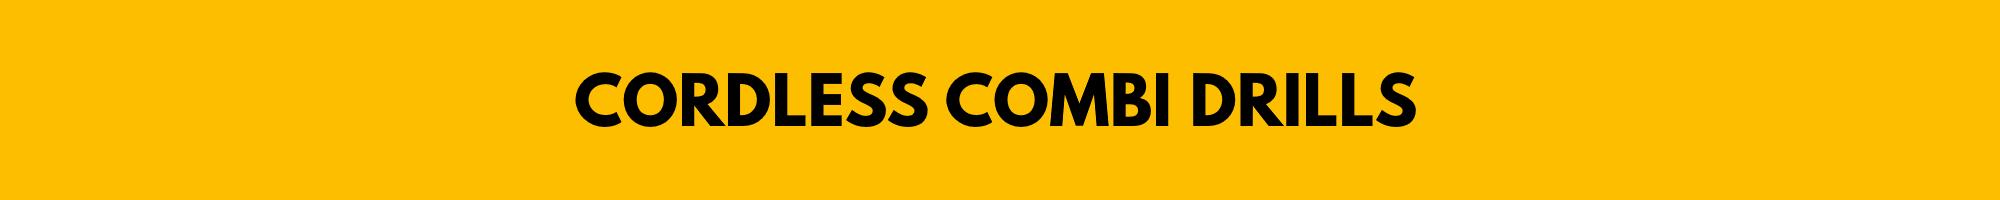 COMBI DRILLS.png